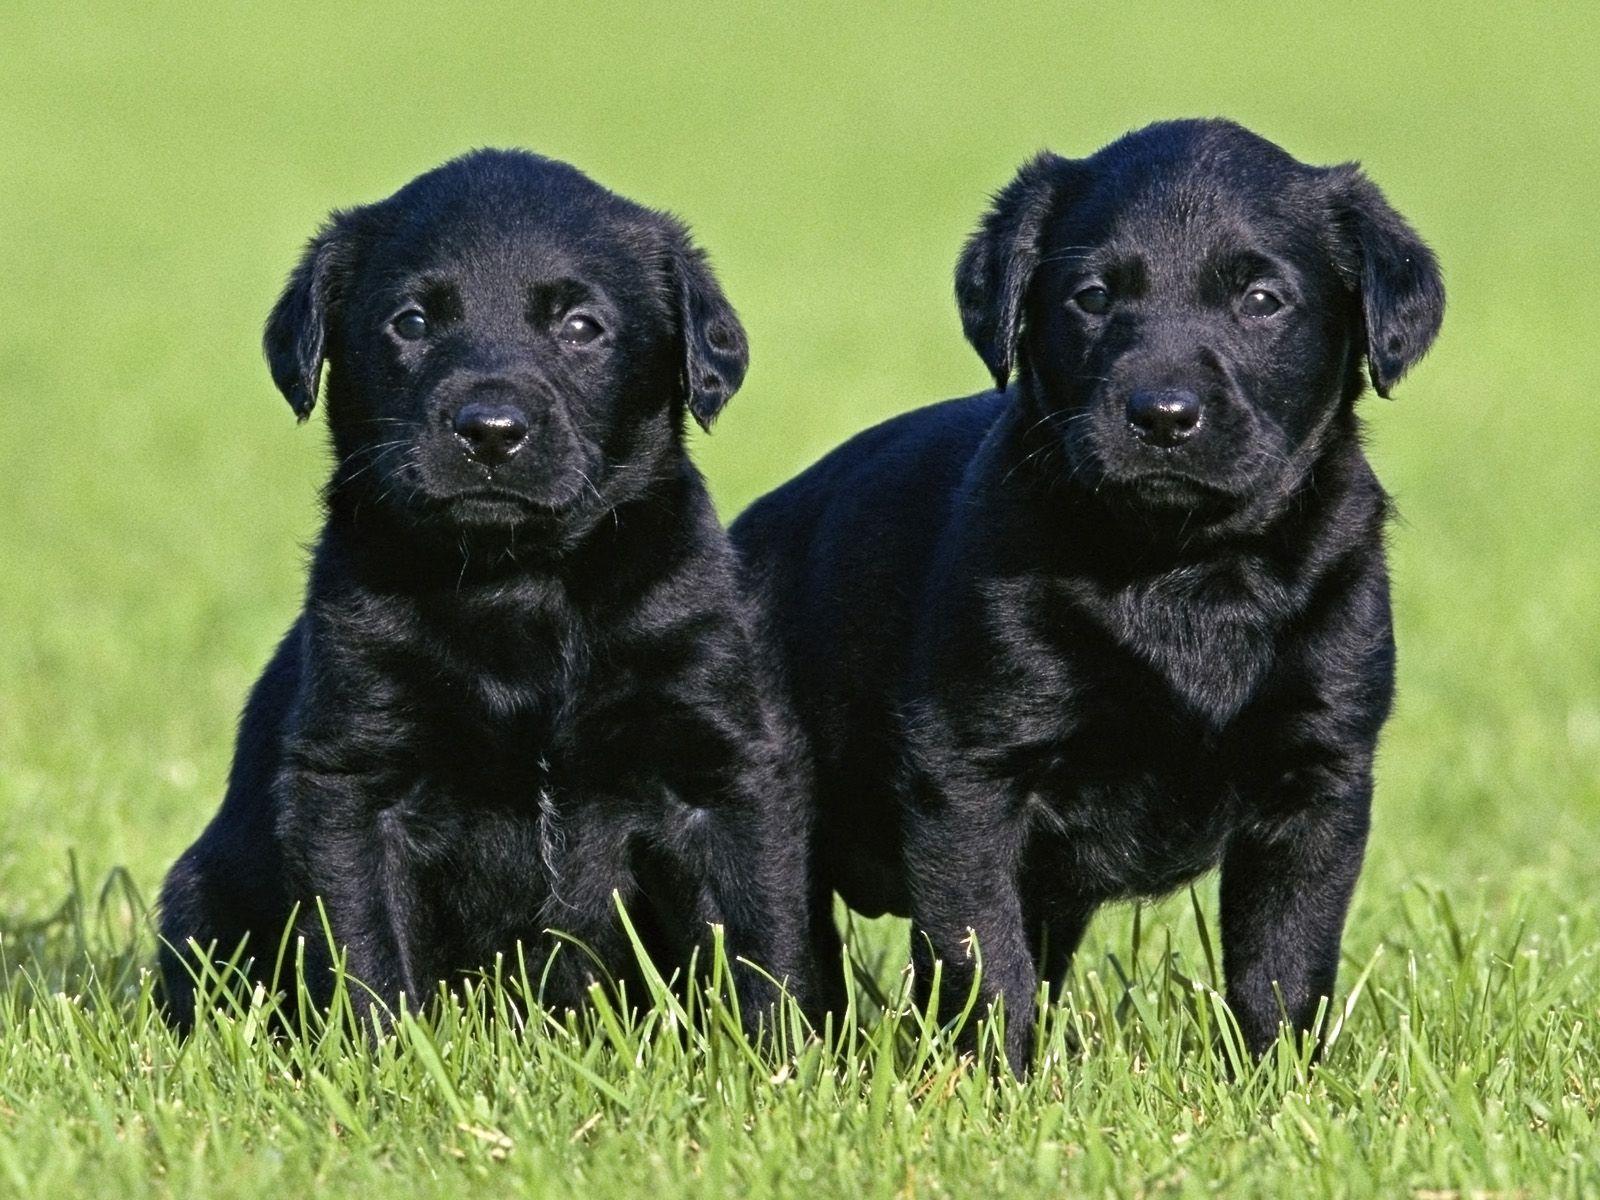 Black labrador puppies labradorpuppies labrador